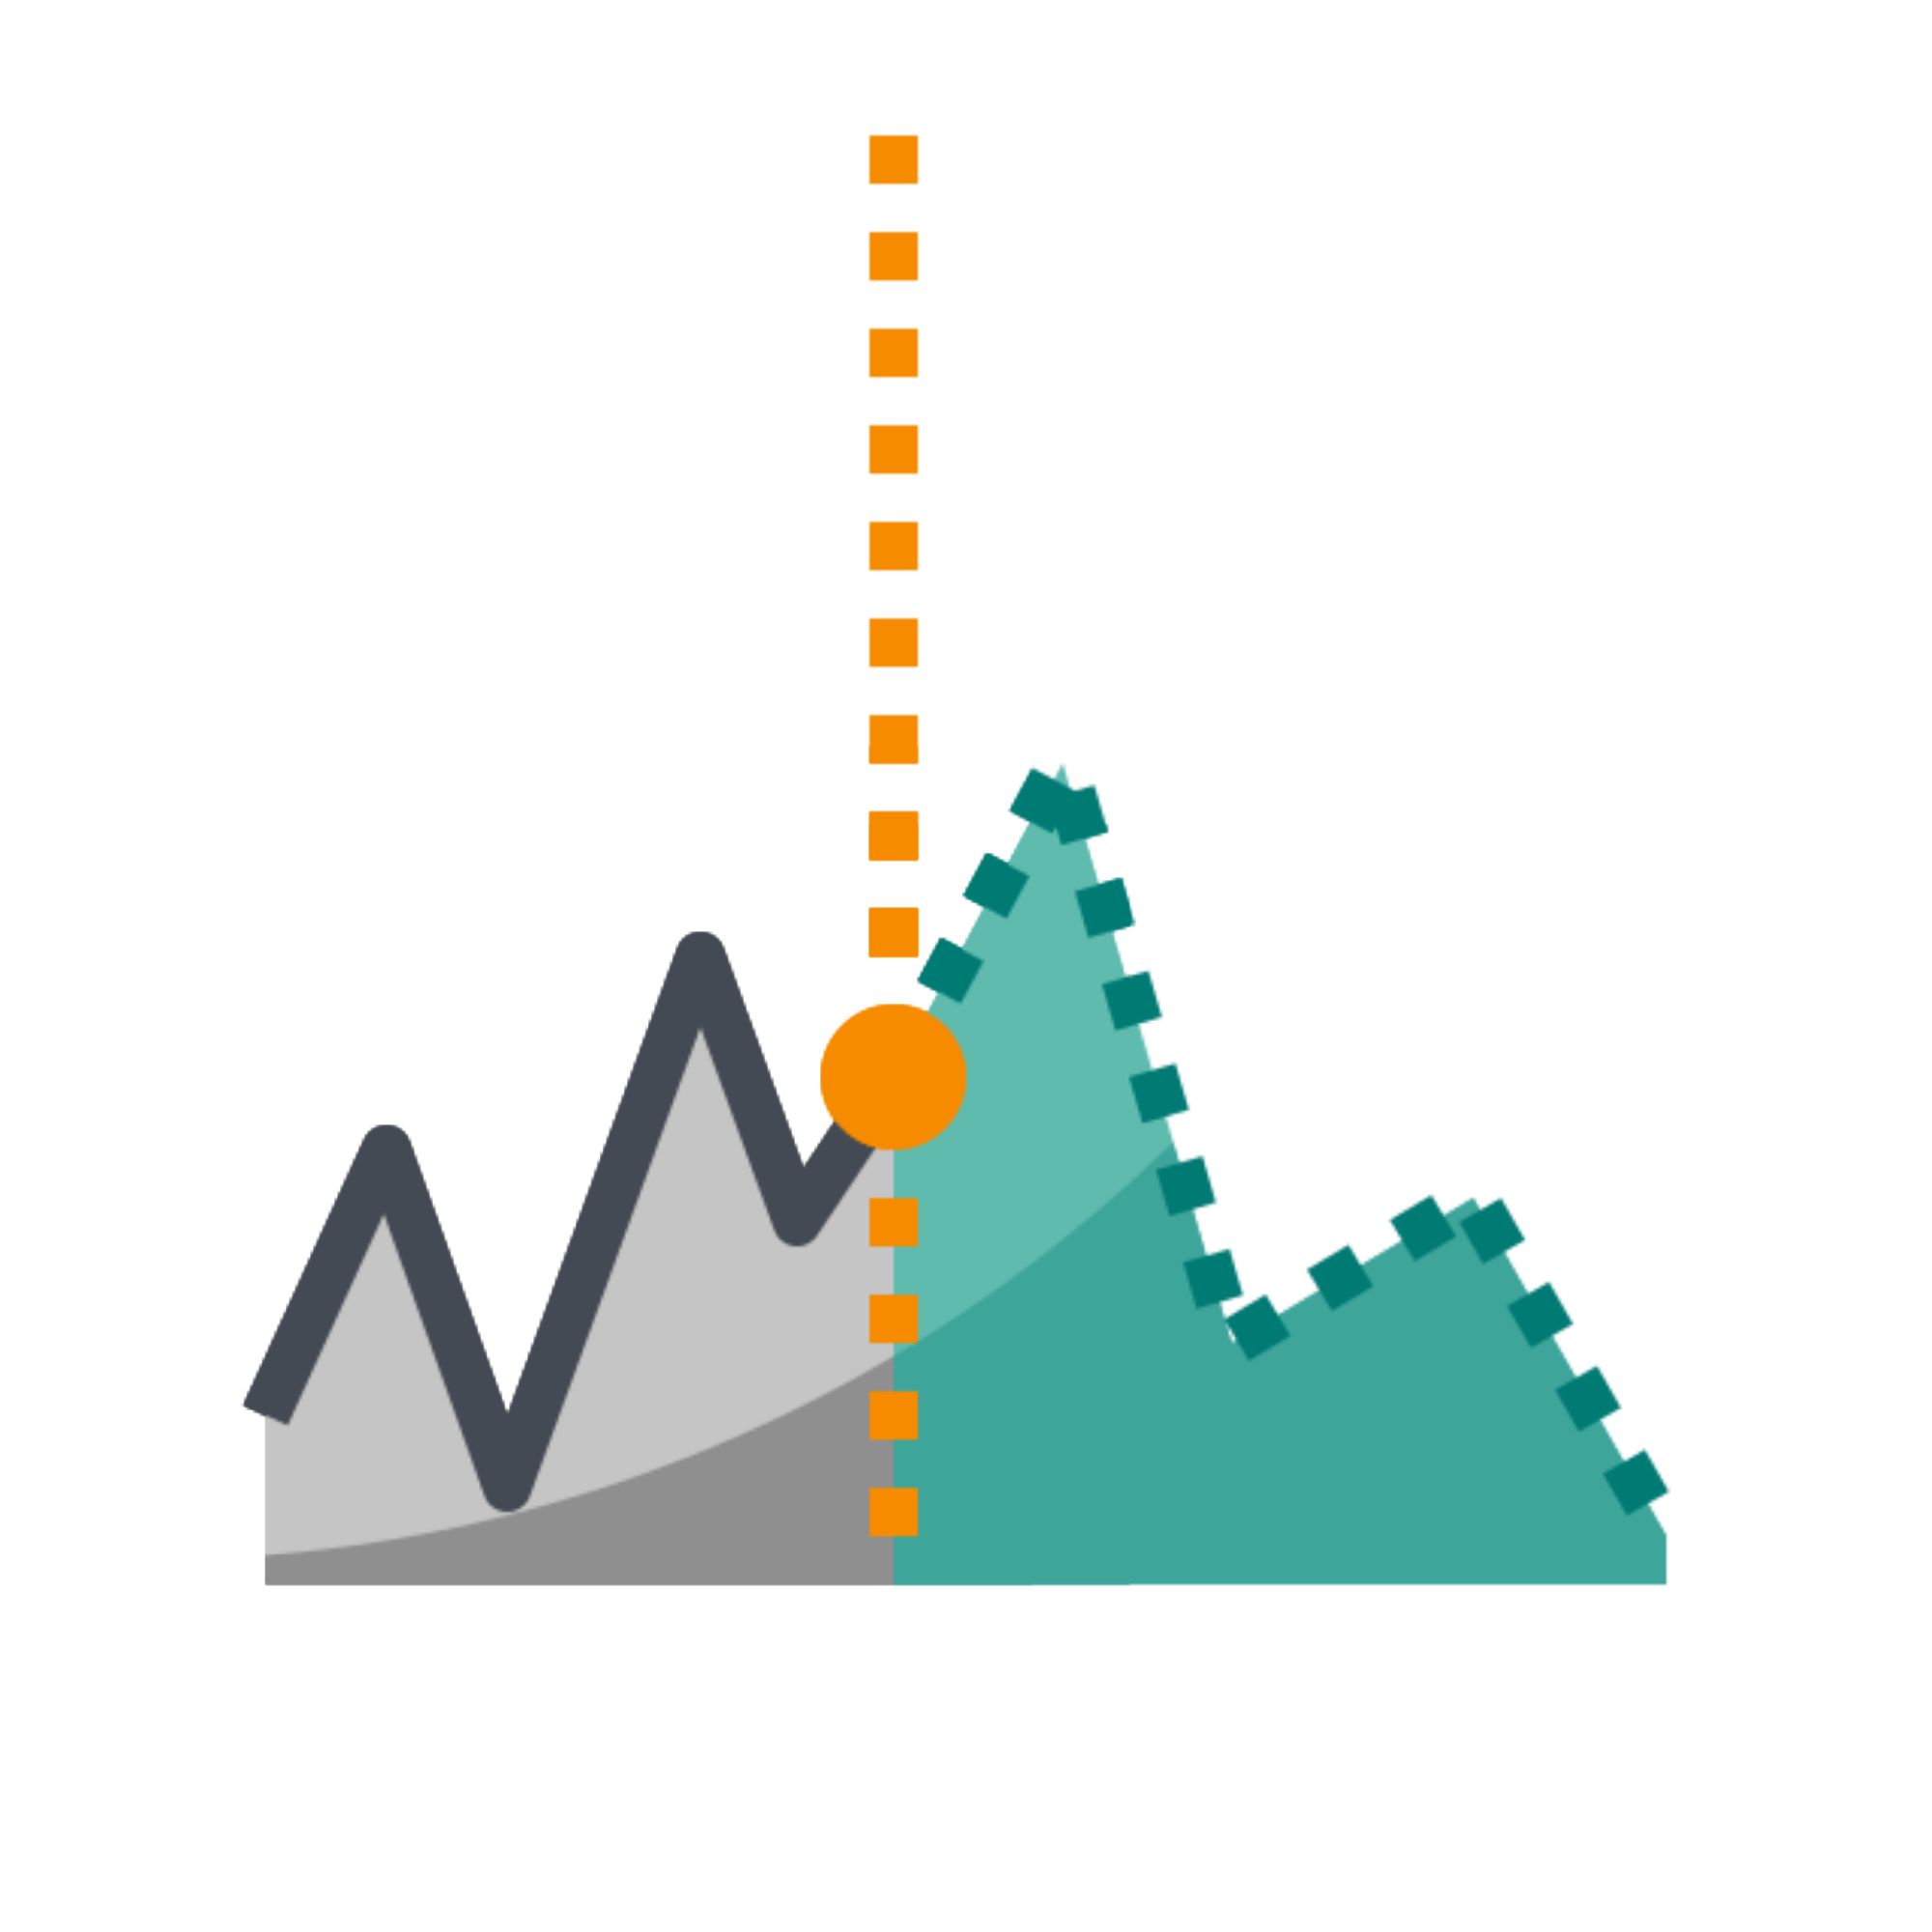 Graph illustrtion